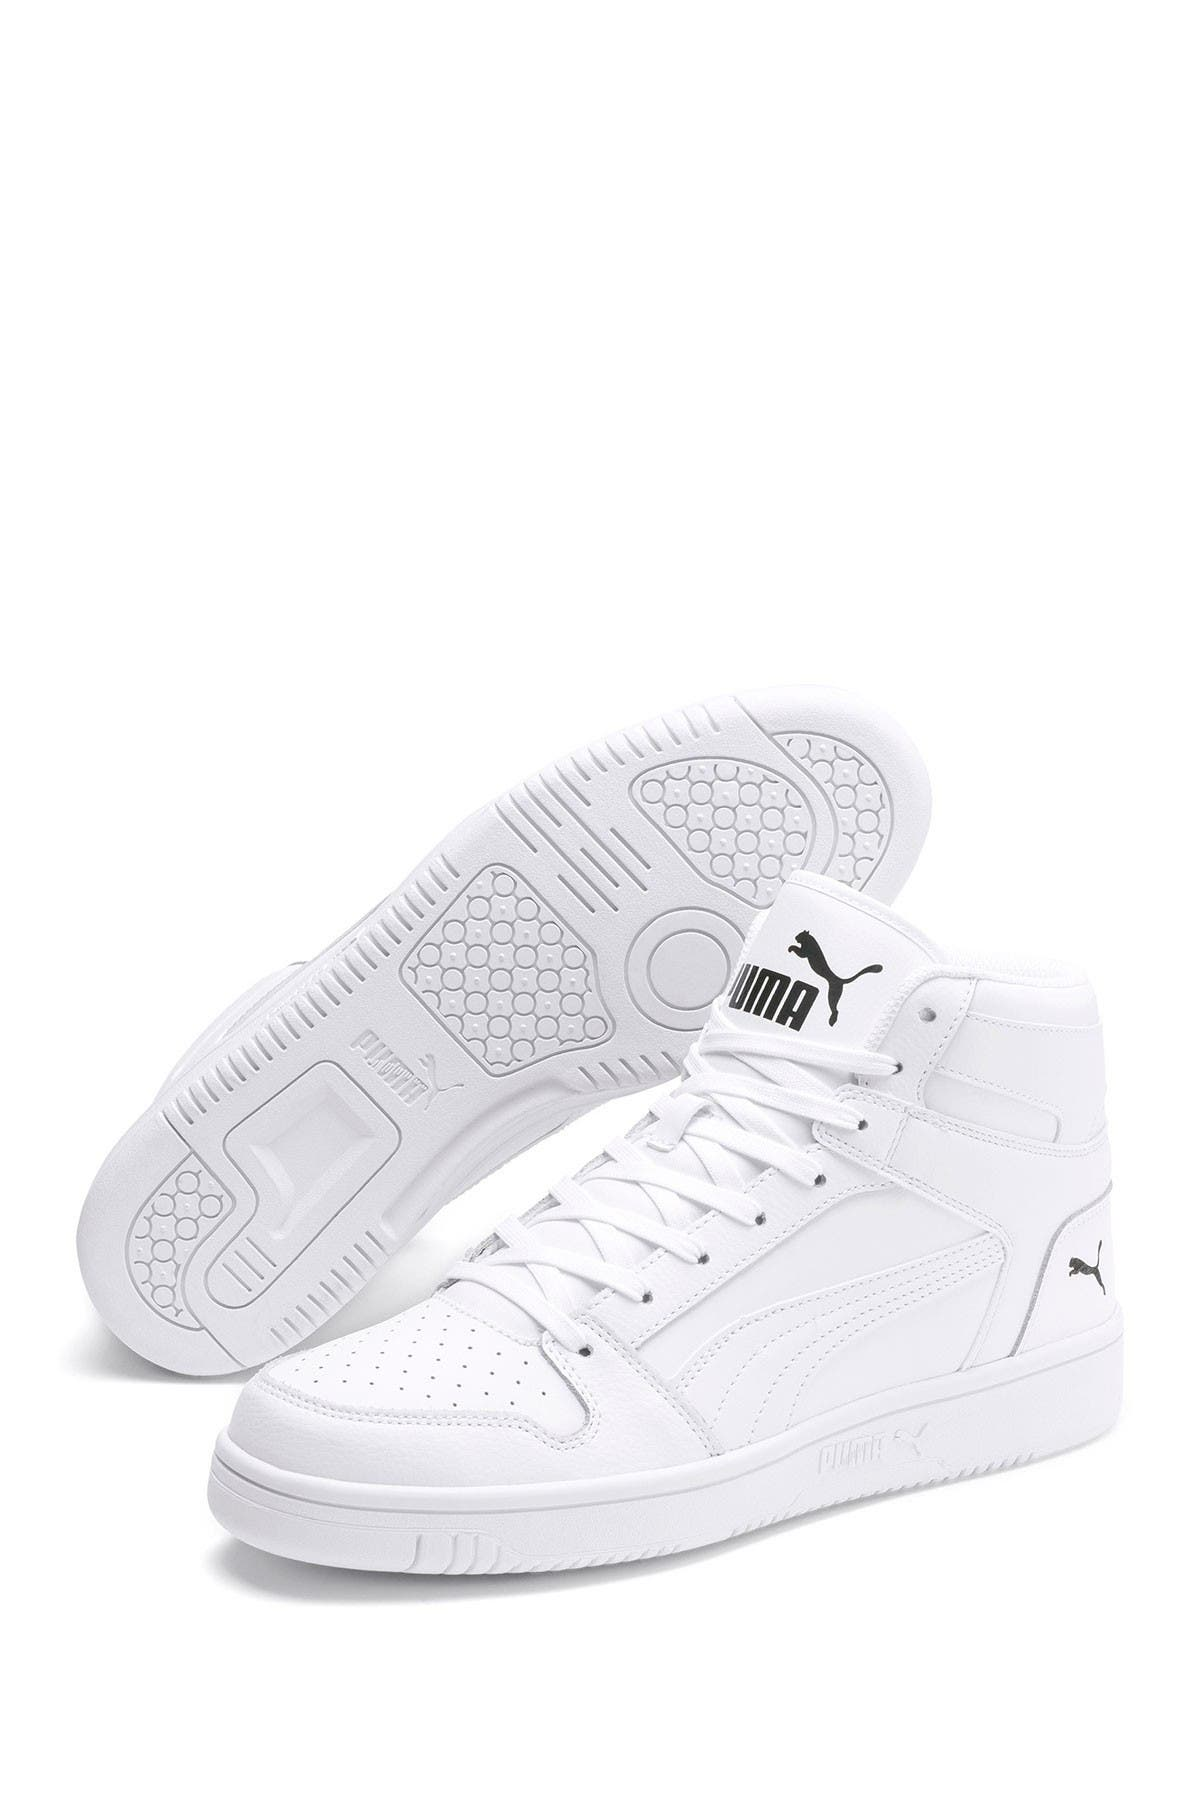 Image of PUMA Rebound LayUp SL High Top Sneaker